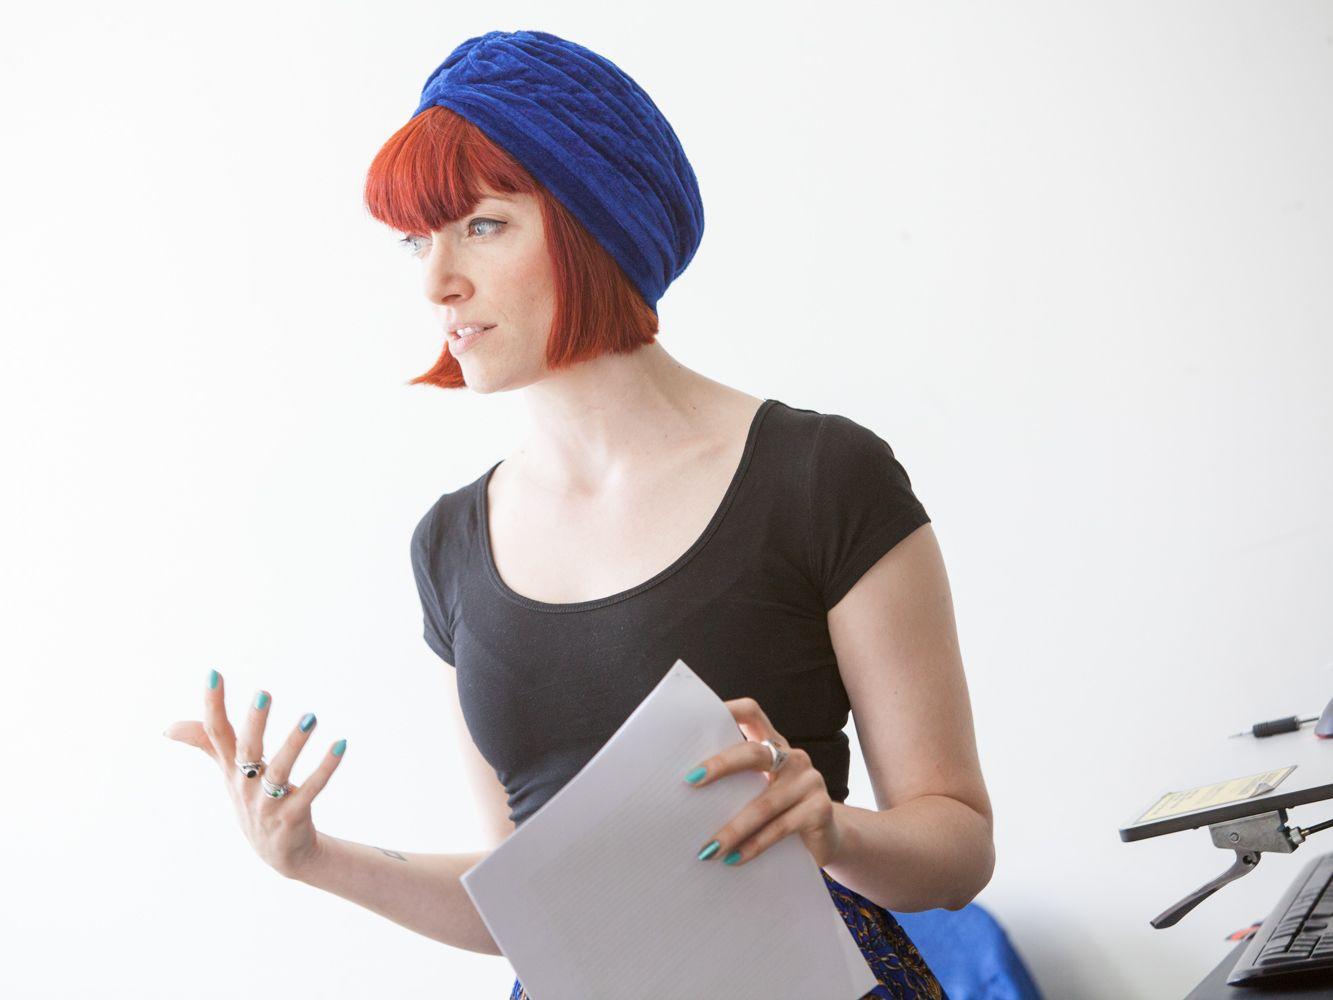 Course tutor Amber Butchart